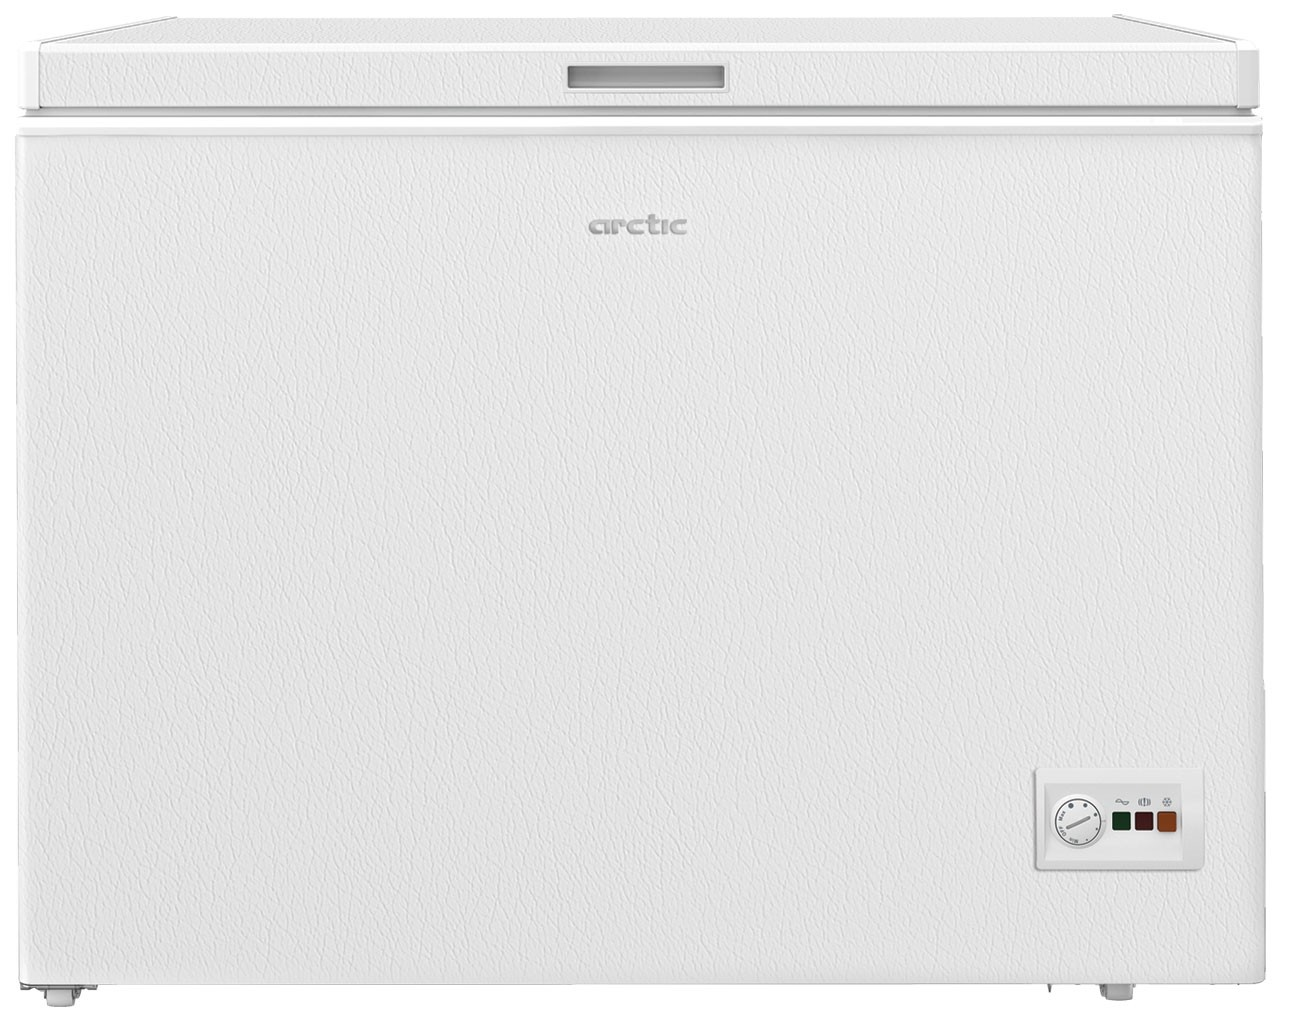 Lada frigorifica, Arctic, AO40P30, 360 l, Clasa F, Alb